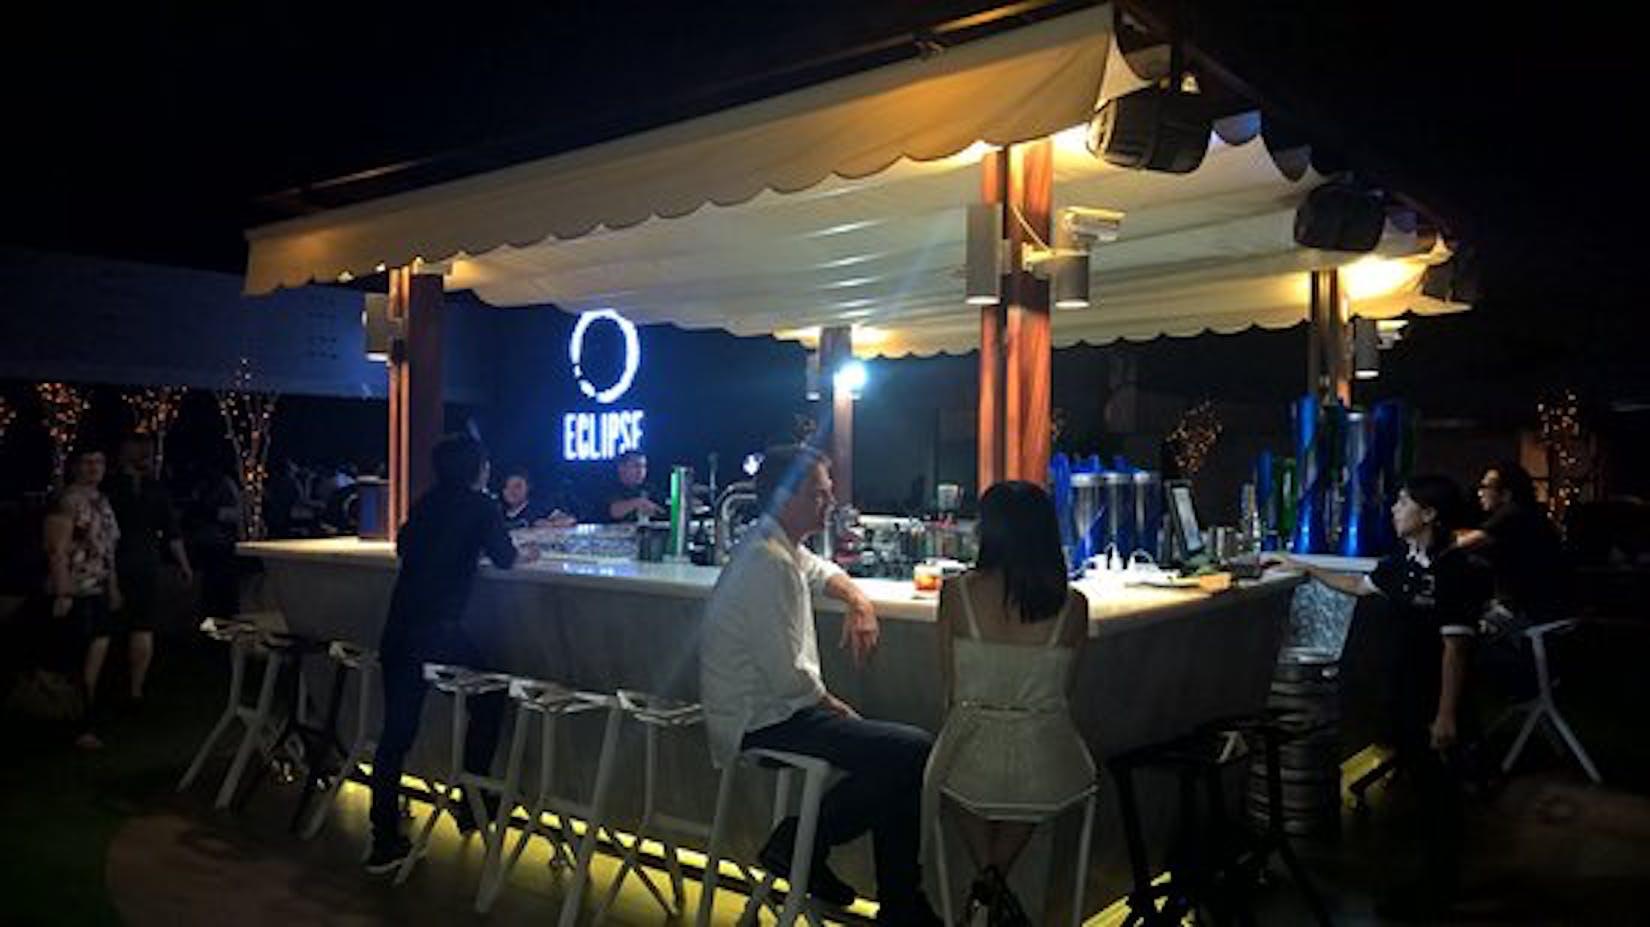 Eclipse Bar & Restaurant | yathar